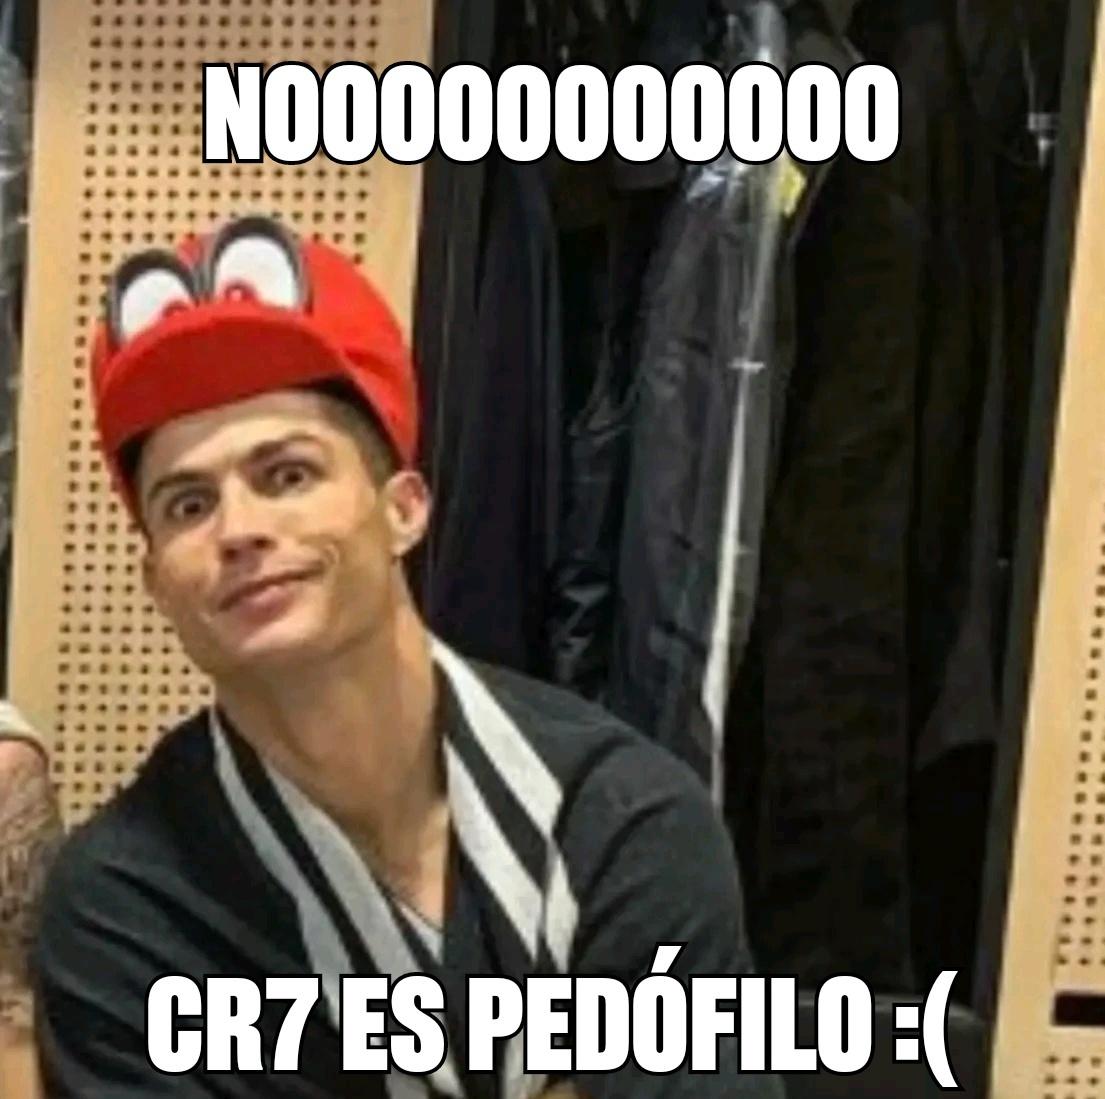 CR7 Pedófilo - meme